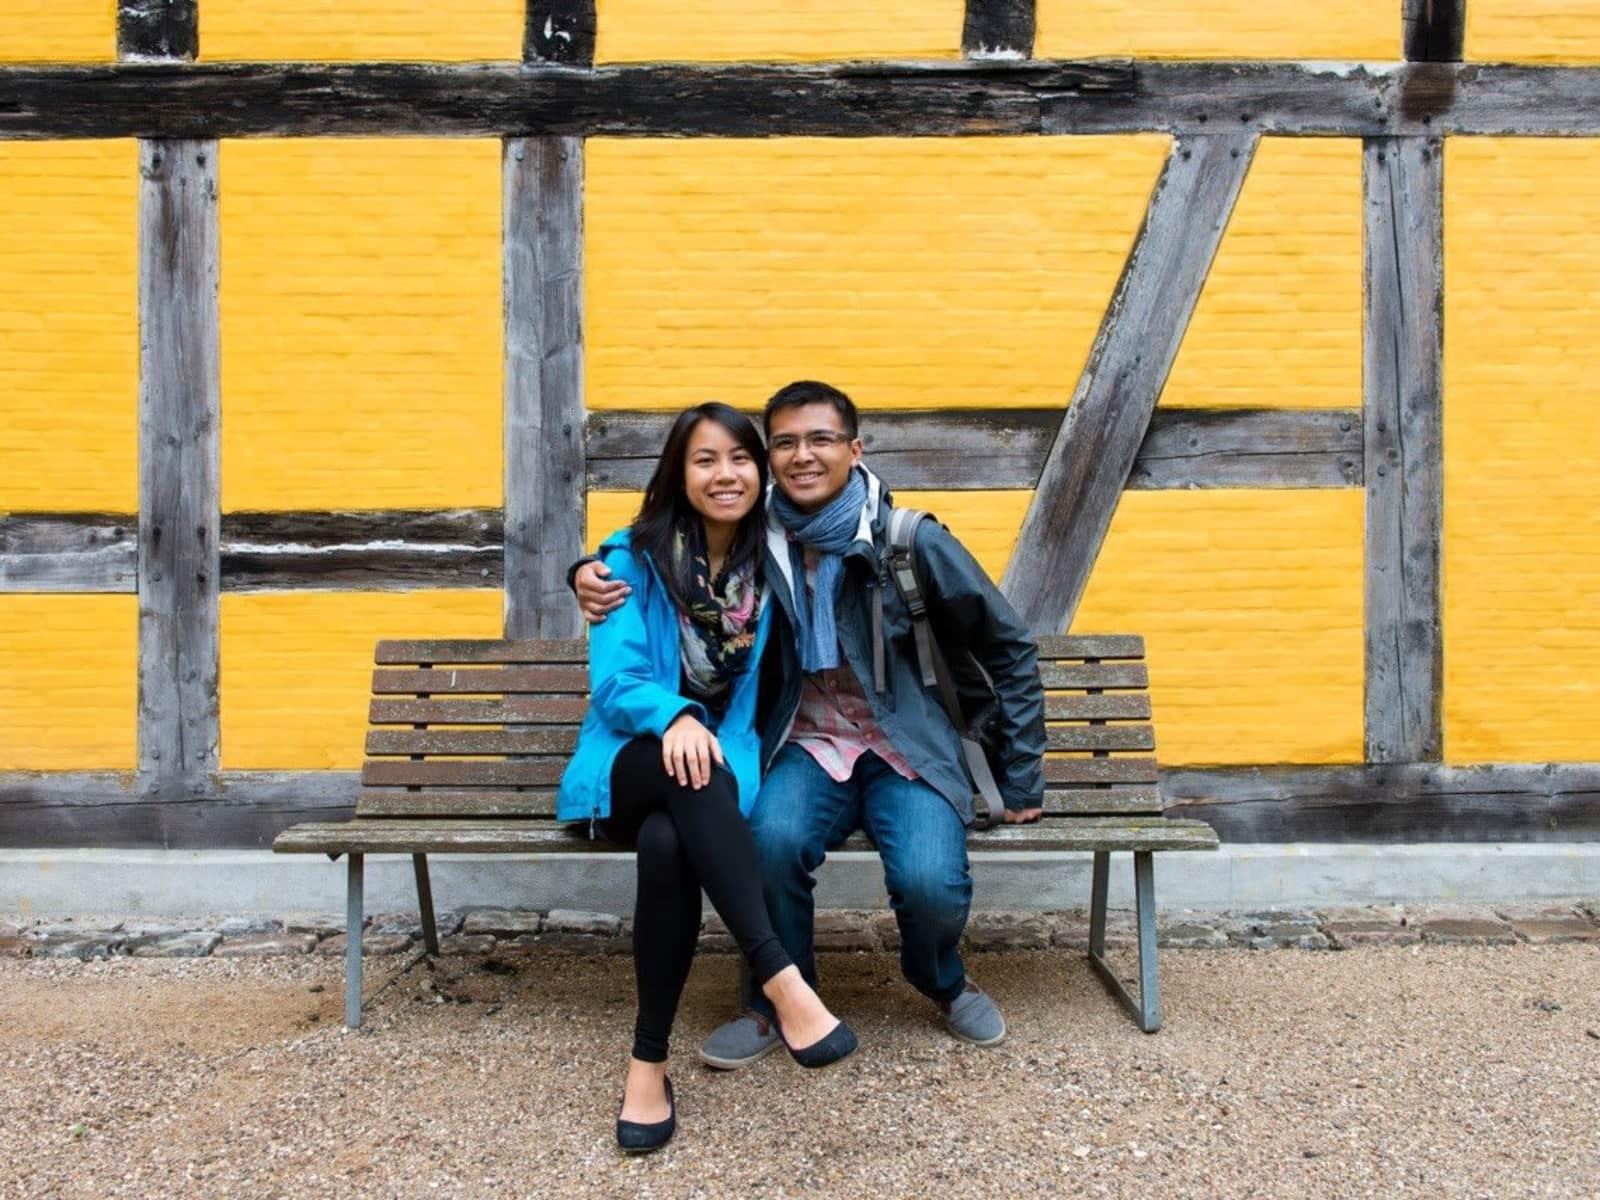 Vicki & Michael from Toronto, Ontario, Canada